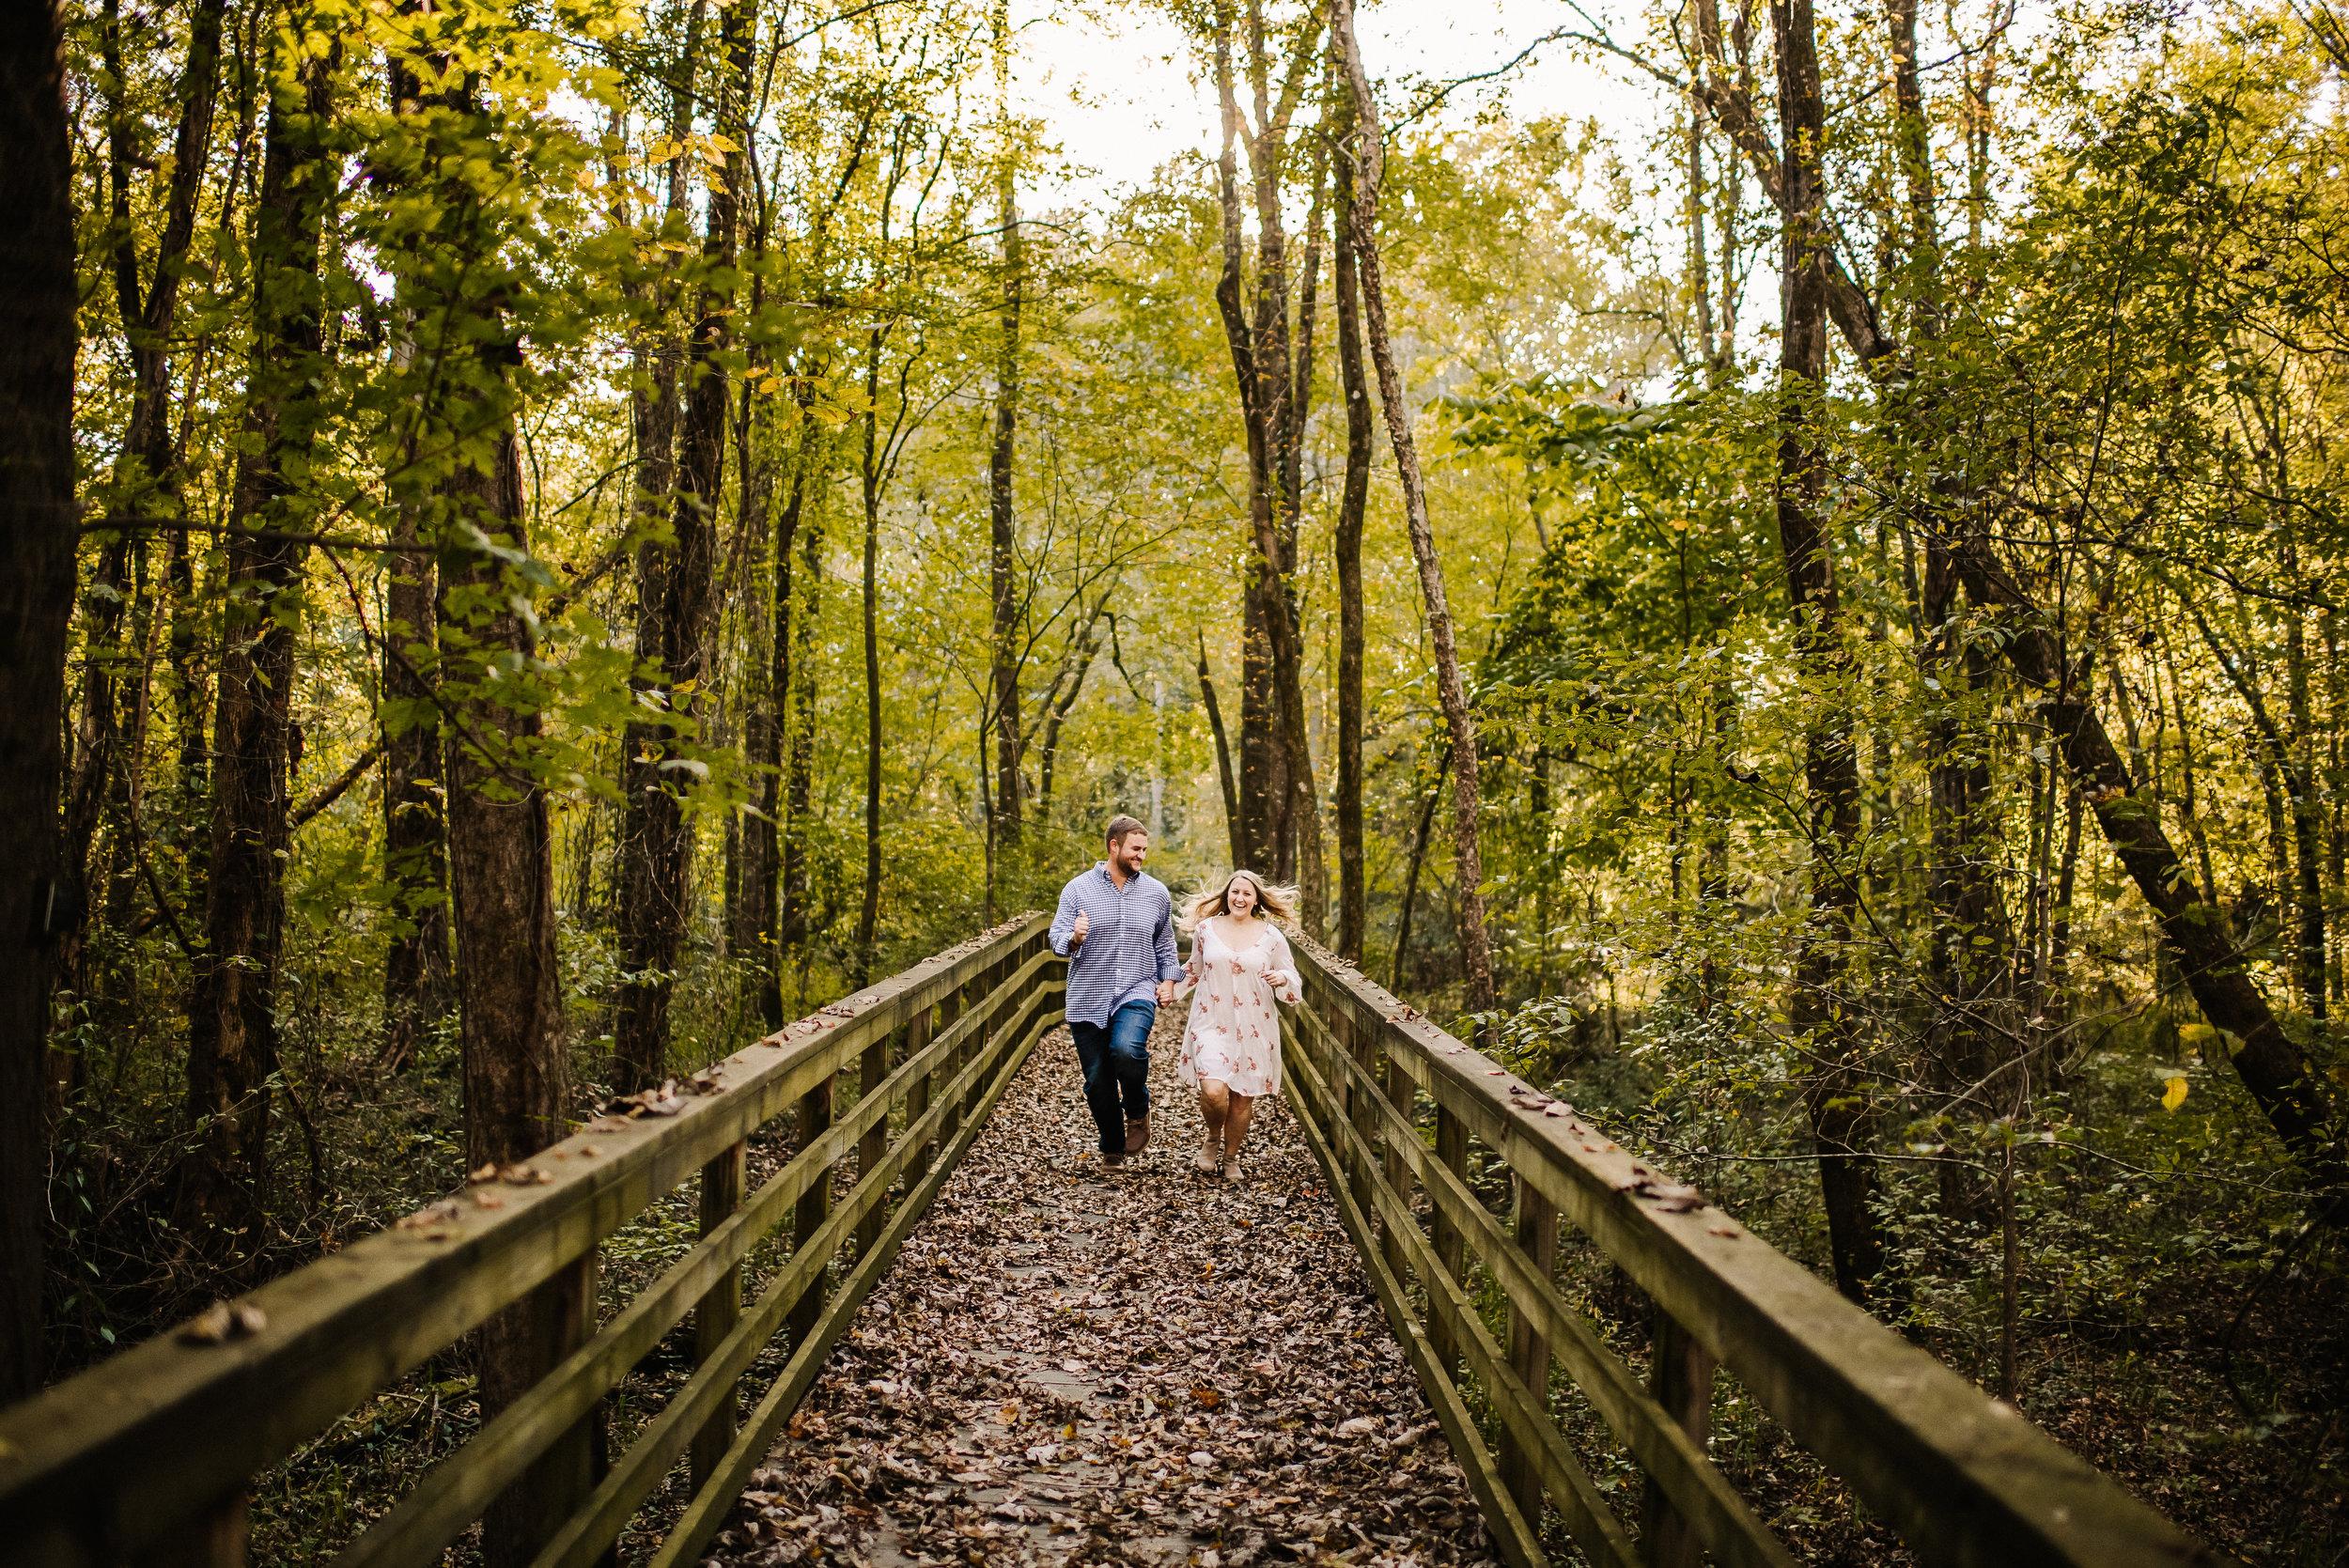 Romantic Fall Engagement Photography_Alexis & Jacob_Ashley Benham Photography-76.jpg